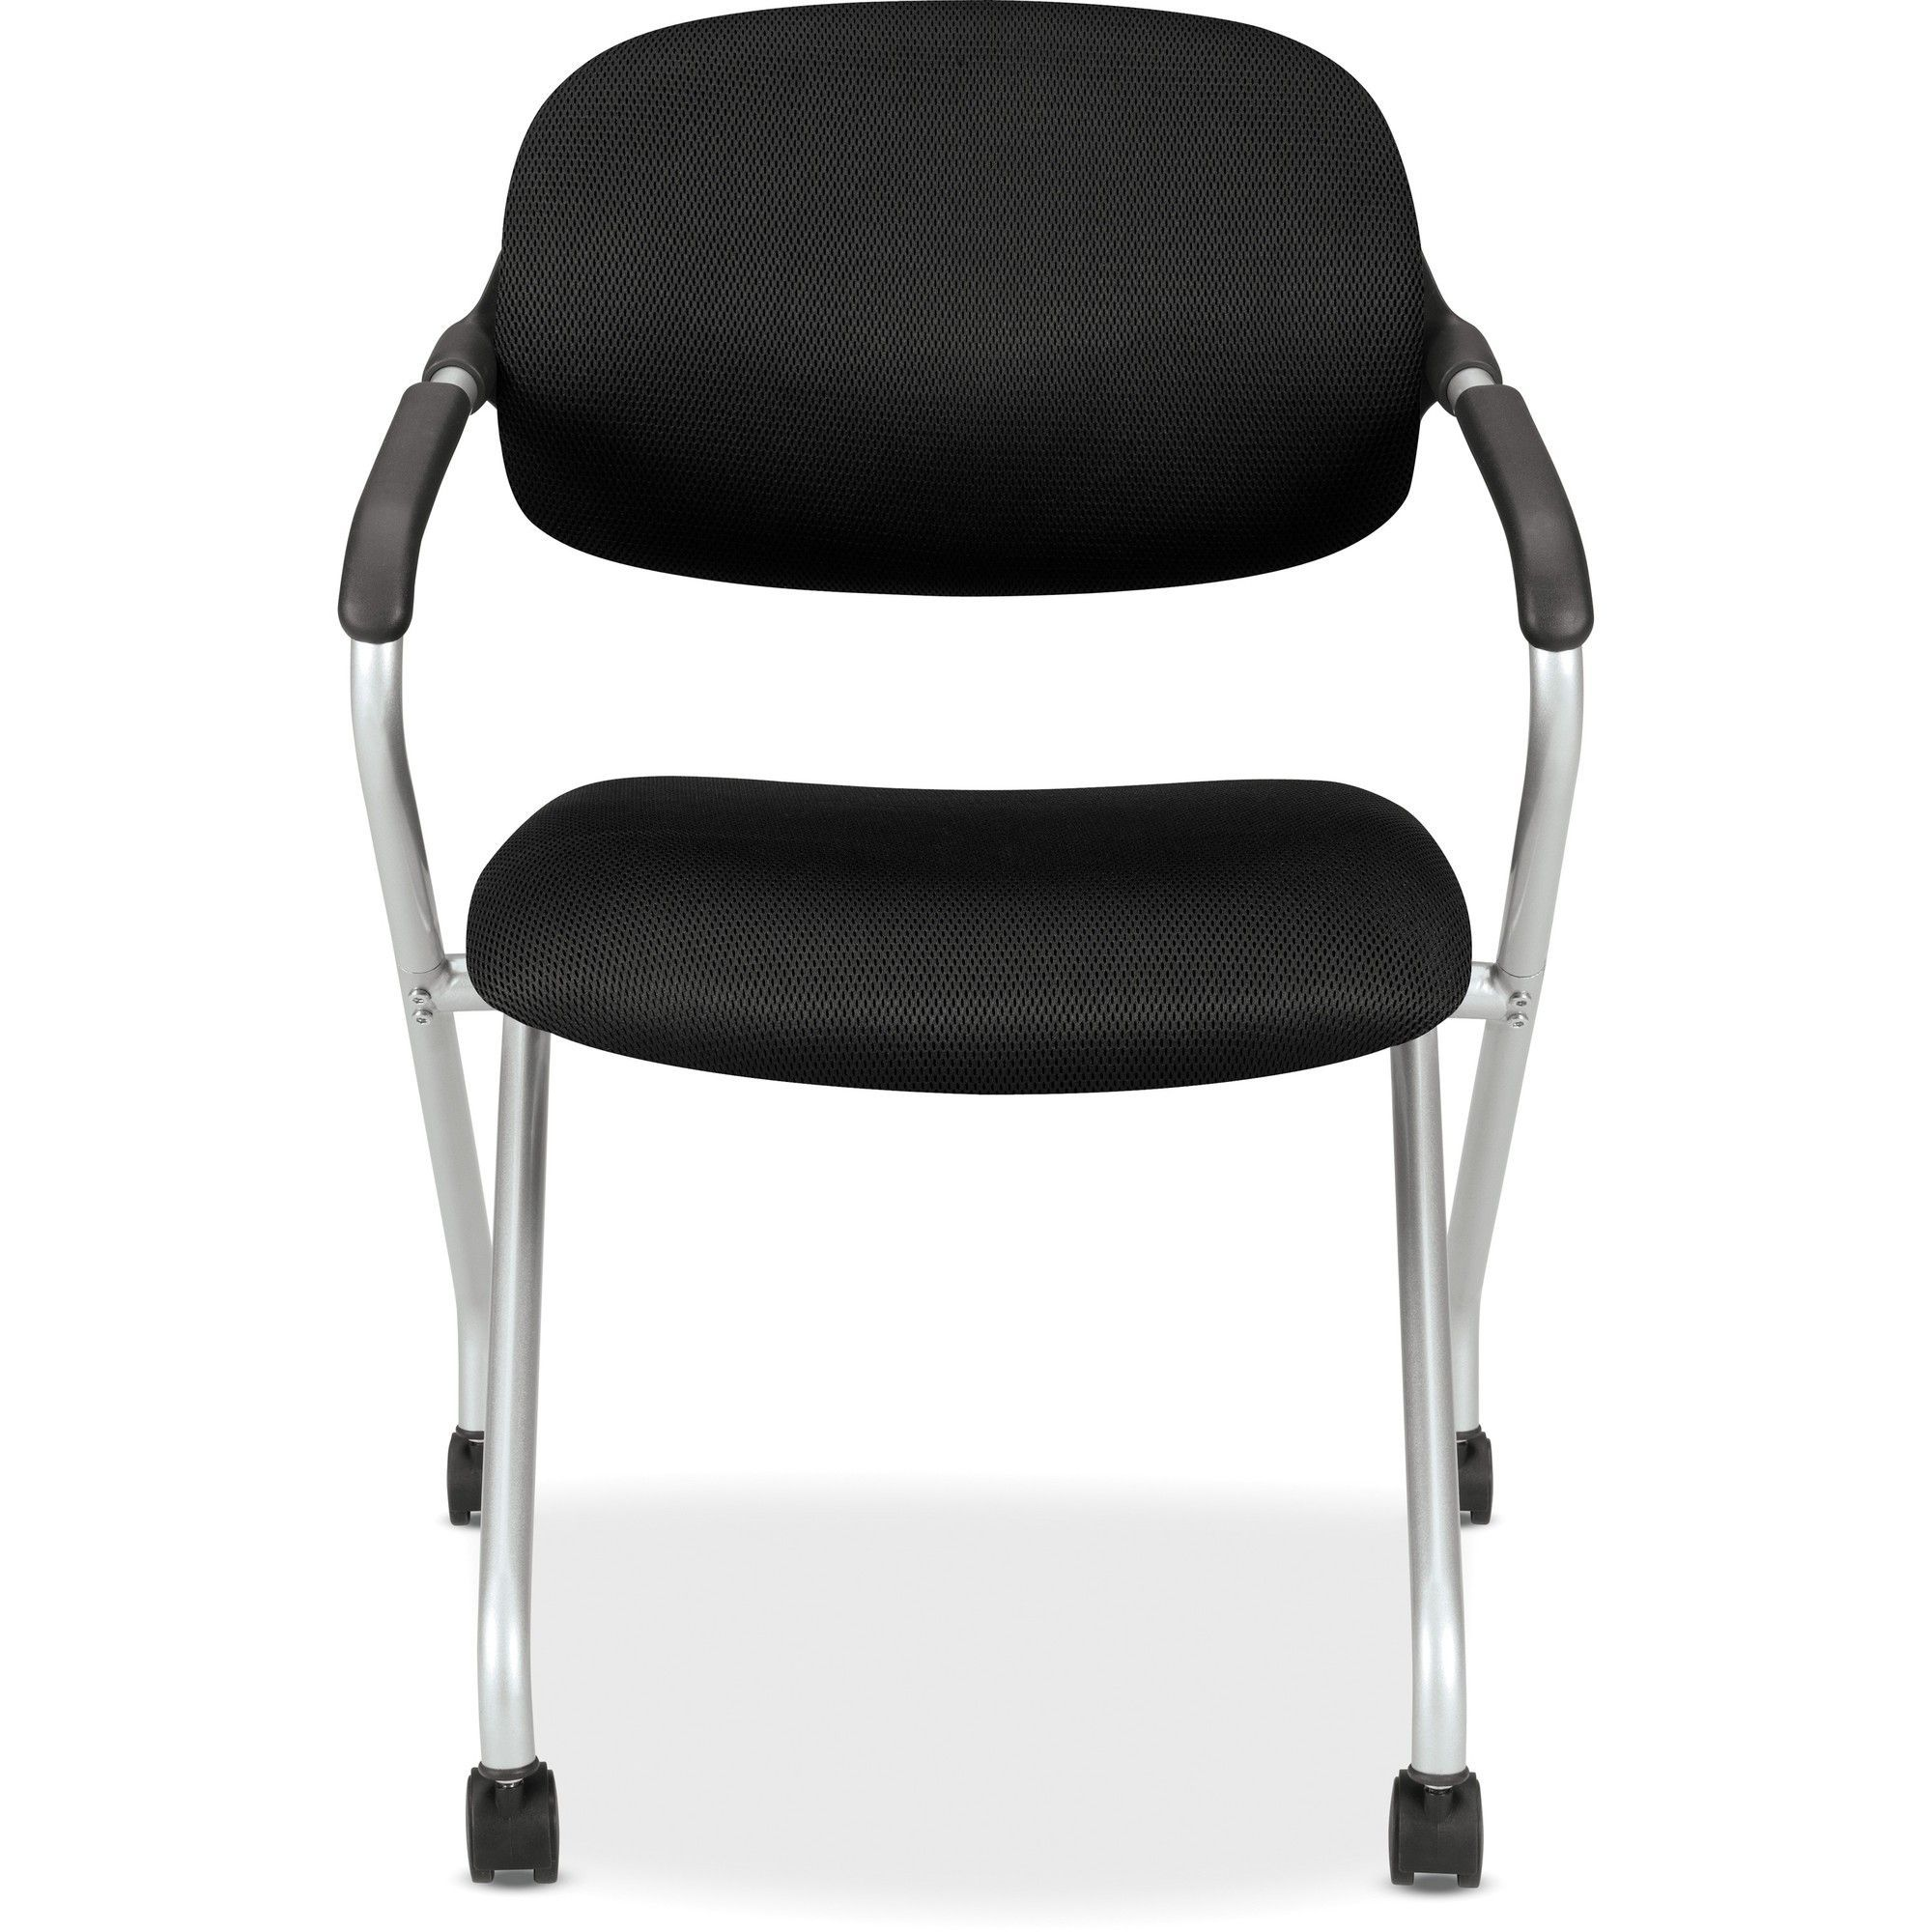 VL300 Series Nesting Chair